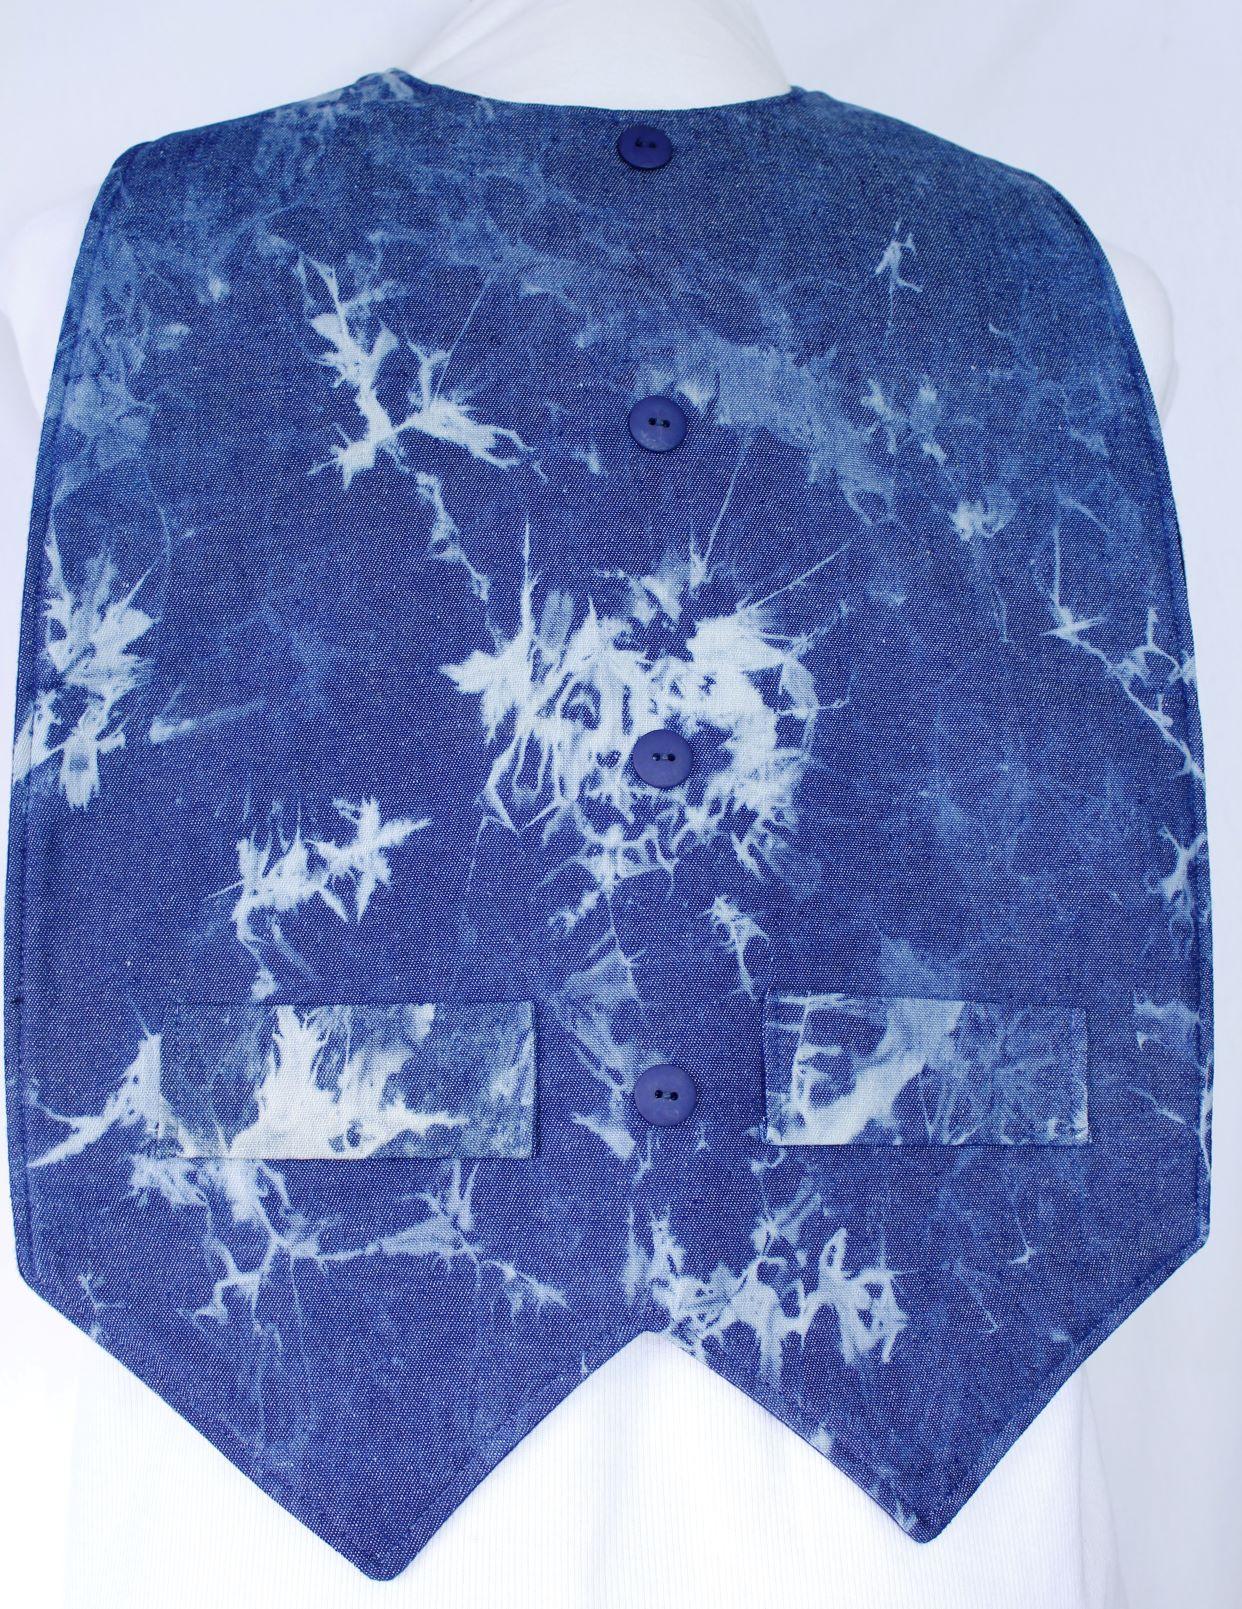 Denim Tye Dye Waistcoat Style - Extra Protect Long Length Clothing Protector